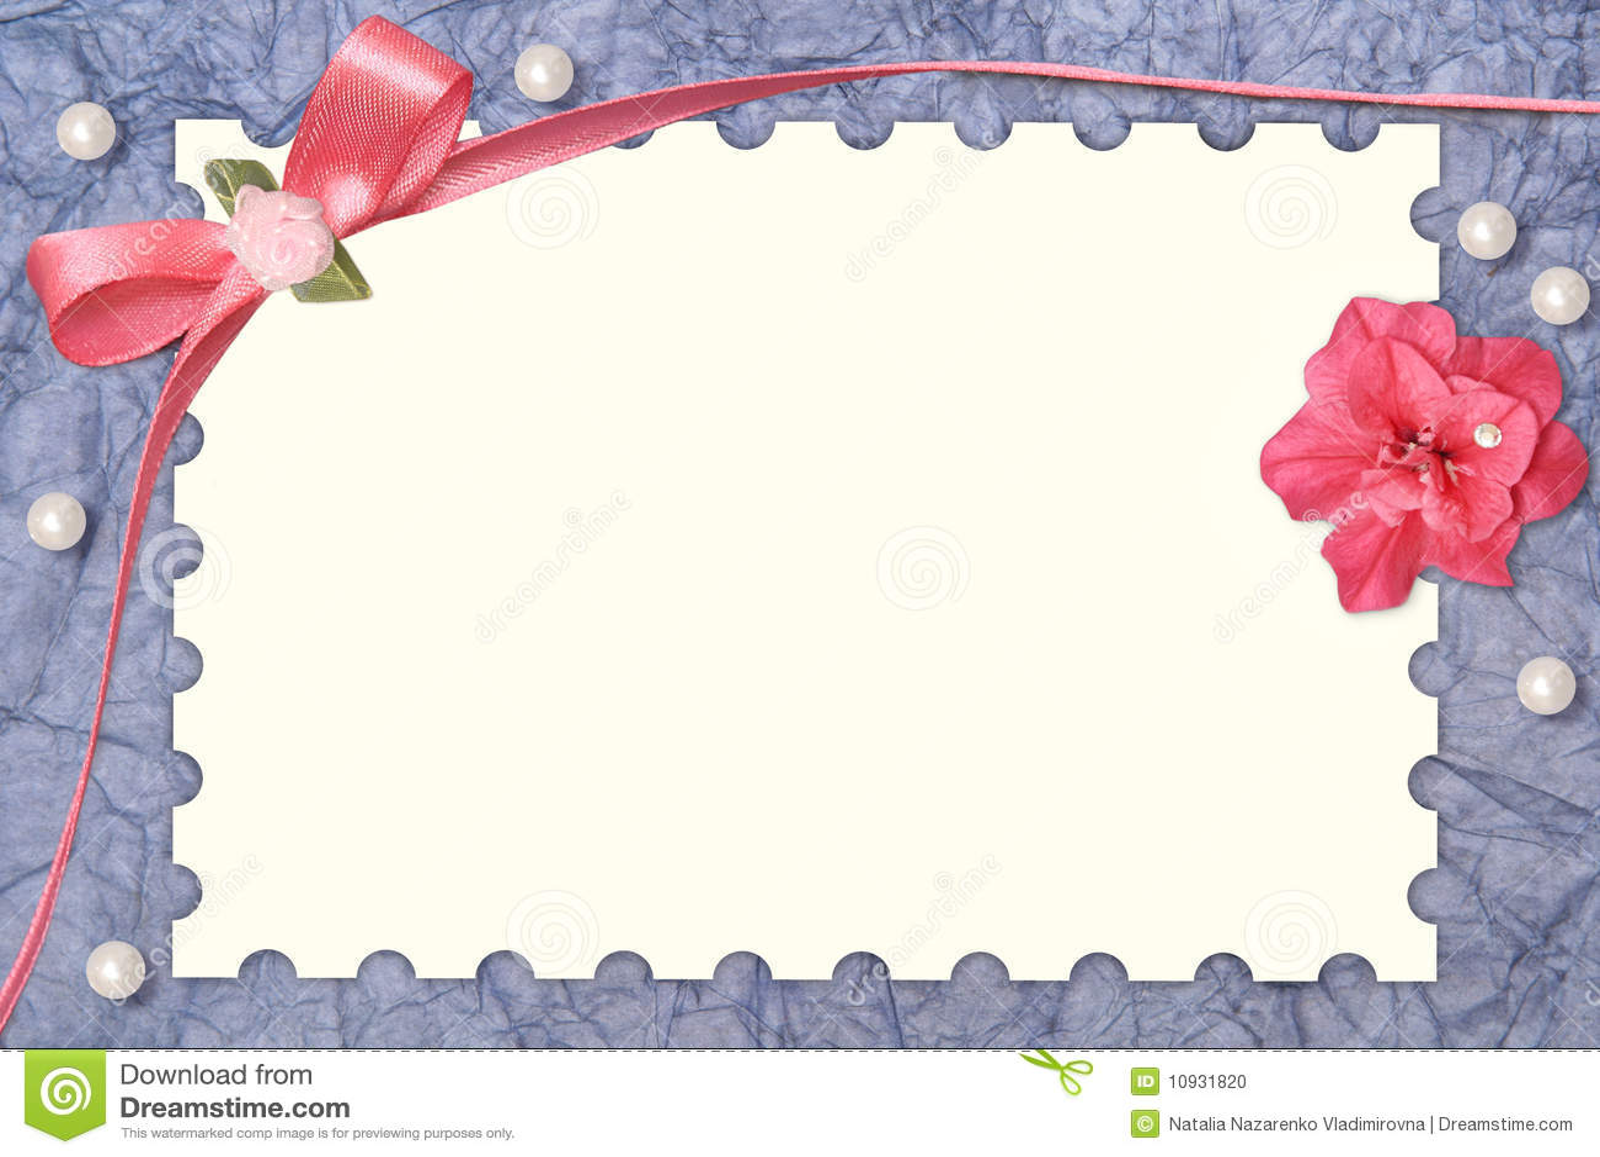 Paper Card With Design Frame Stock Illustration - Illustration of ...